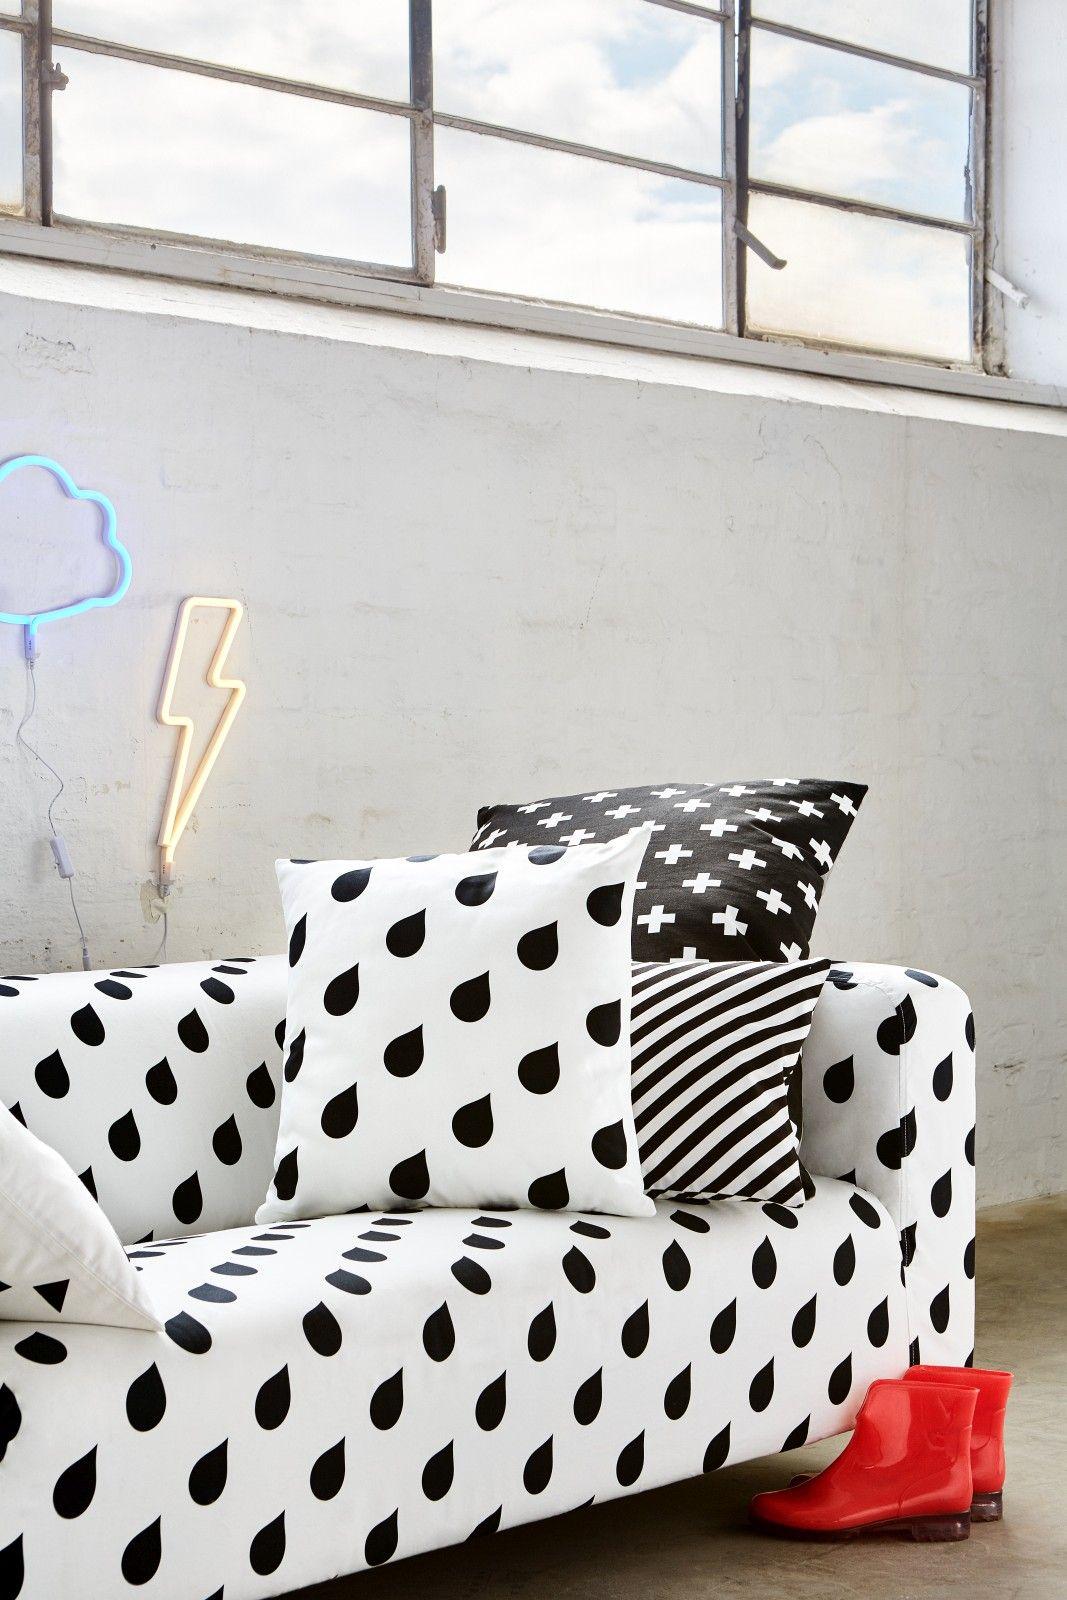 Water Drops Ikea Klippan Cover Ikea Couch Covers Interior Klippan